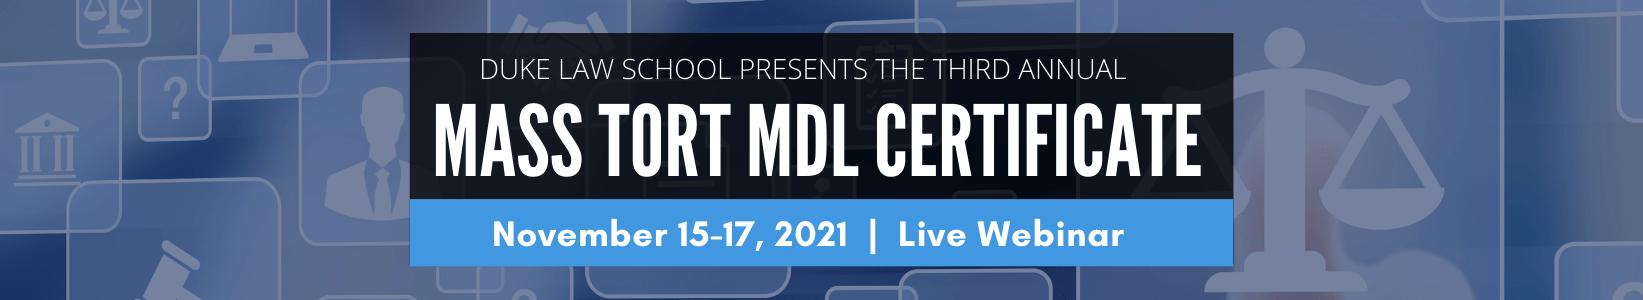 Duke Law School Presents the Third Annual Mass Tort MDL Certificate. November 15-17, 2021. Live Webinar